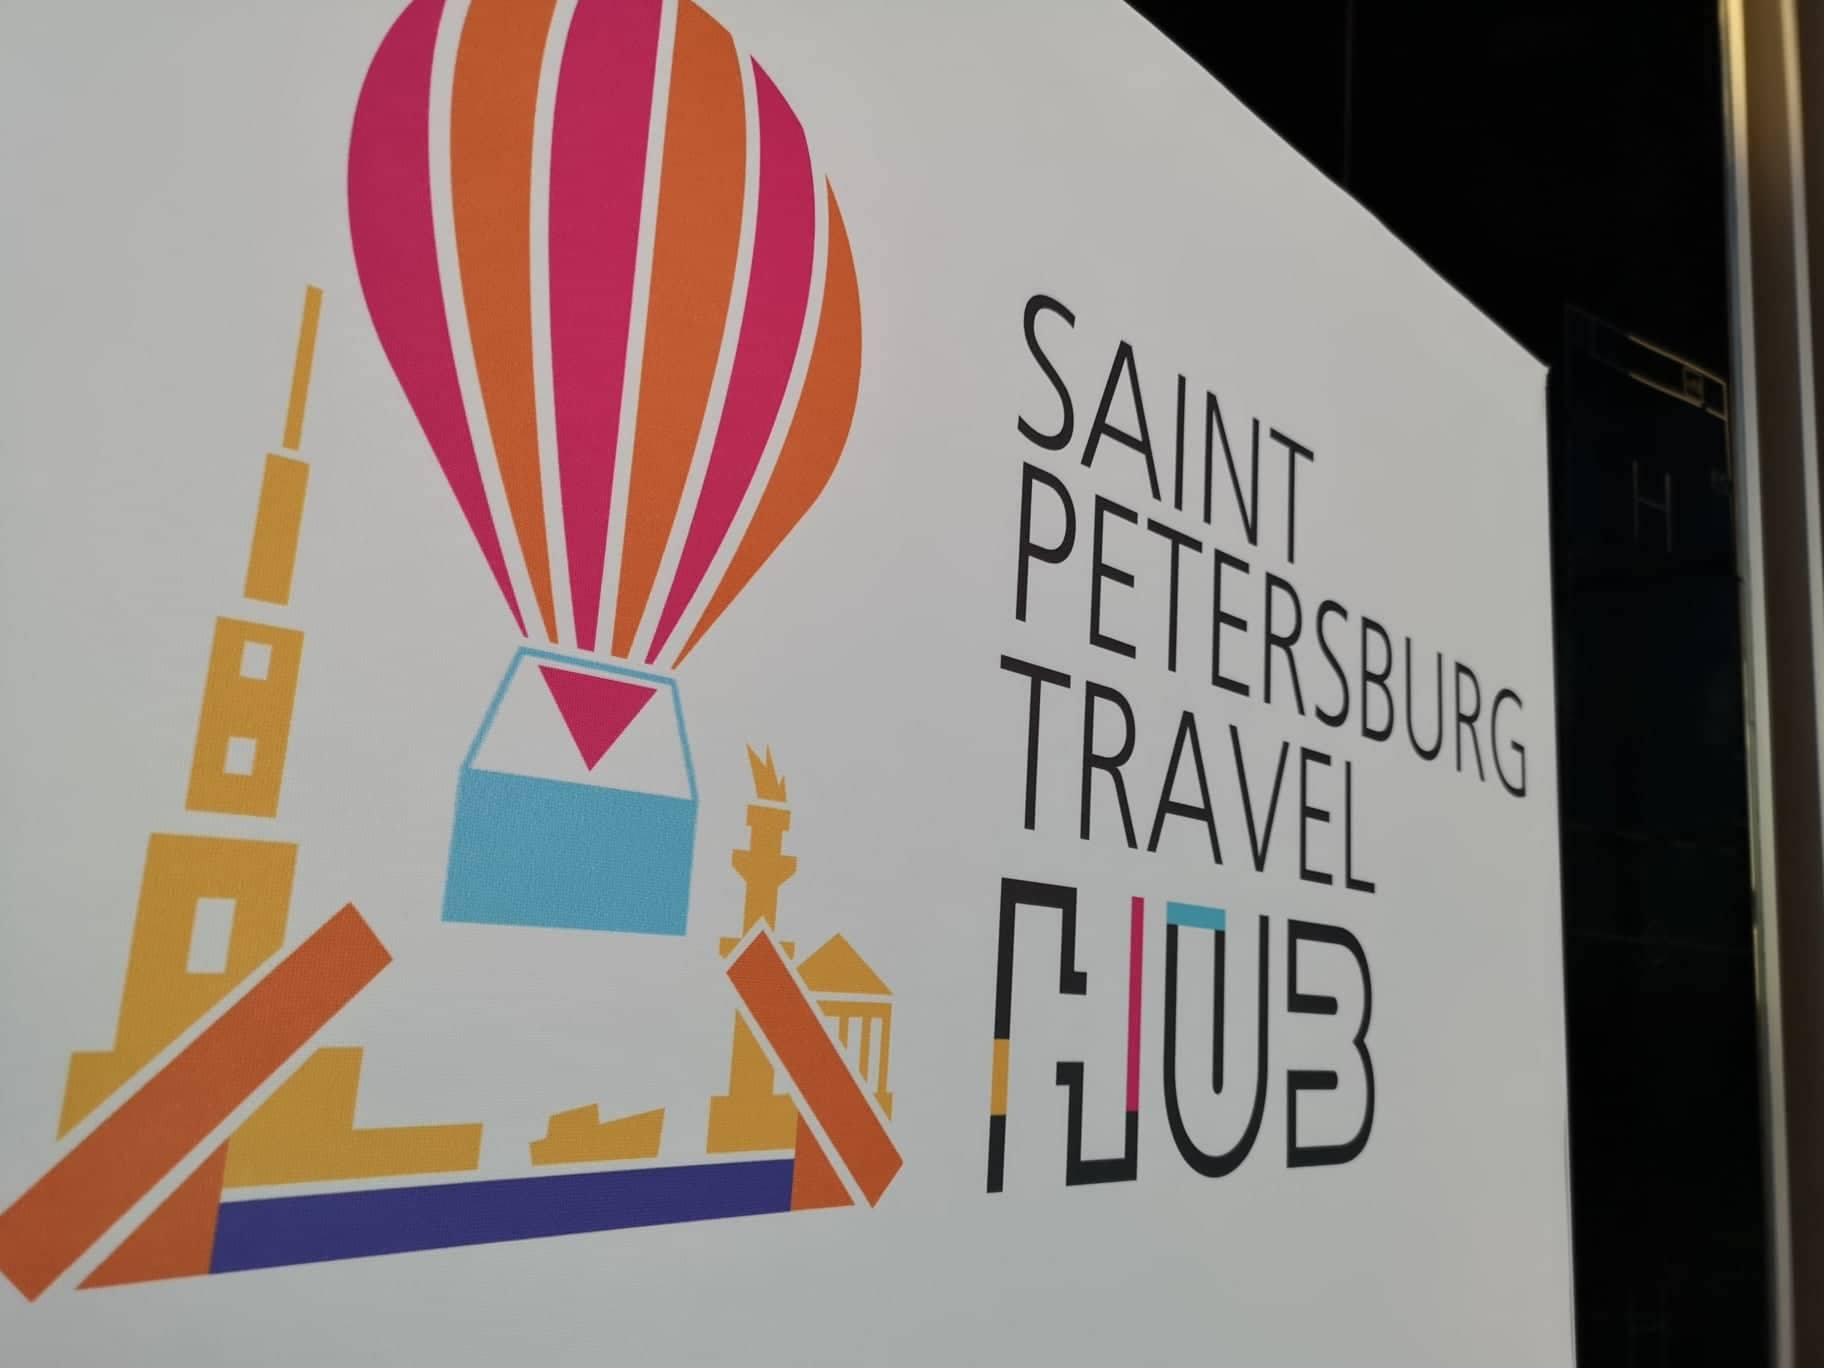 Комитет по развитию туризма Санкт-Петербурга провел SAINT-PETERSBURG TRAVEL HUB